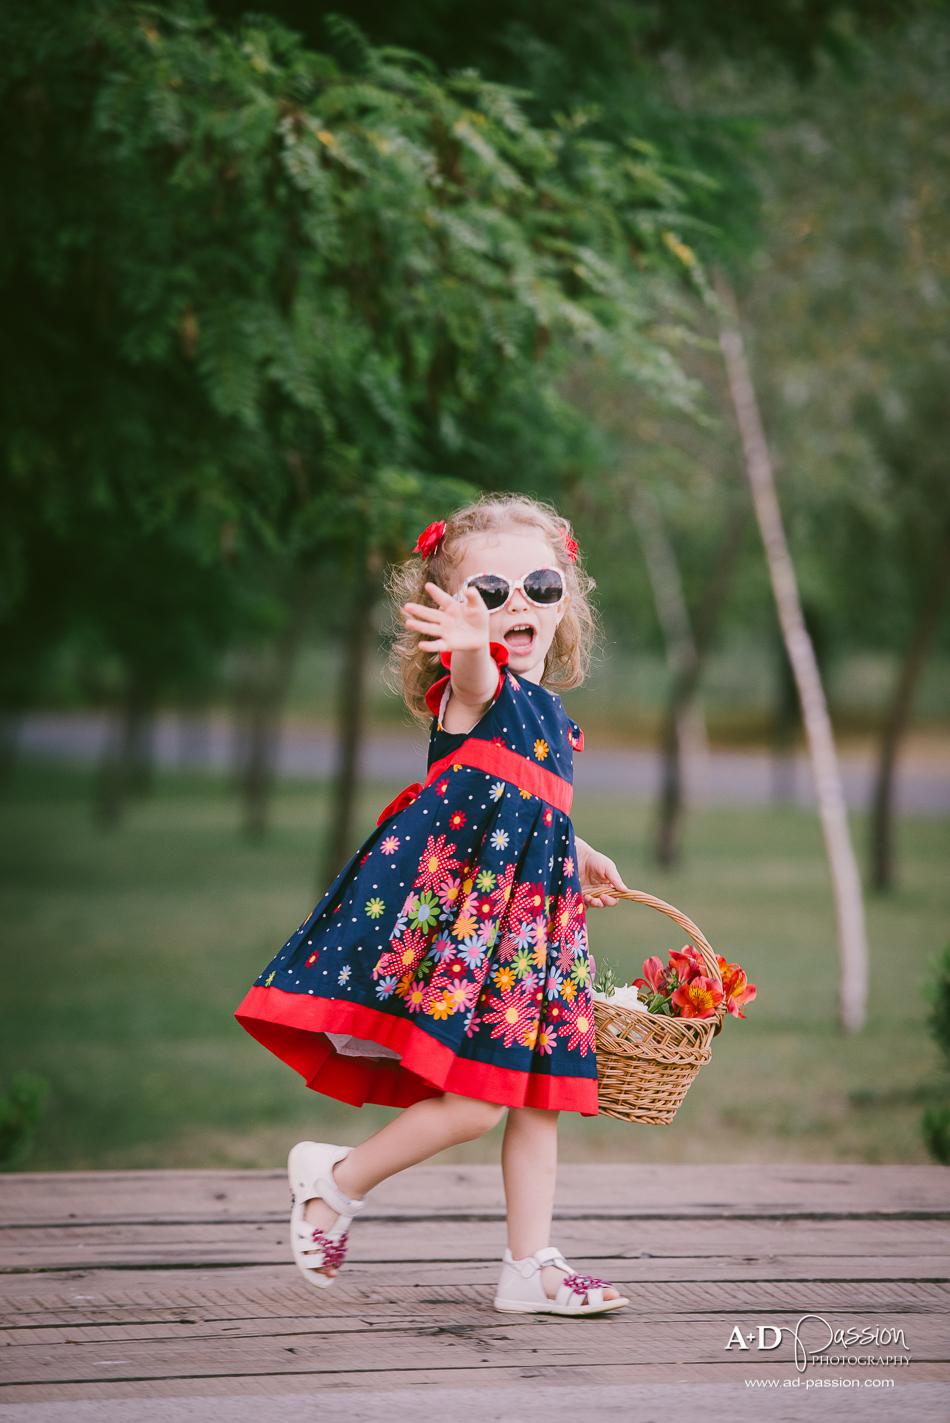 AD Passion Photography | 20150622_sedinta-foto-alexaandra-tony-yasena_0043 | Adelin, Dida, fotograf profesionist, fotograf de nunta, fotografie de nunta, fotograf Timisoara, fotograf Craiova, fotograf Bucuresti, fotograf Arad, nunta Timisoara, nunta Arad, nunta Bucuresti, nunta Craiova